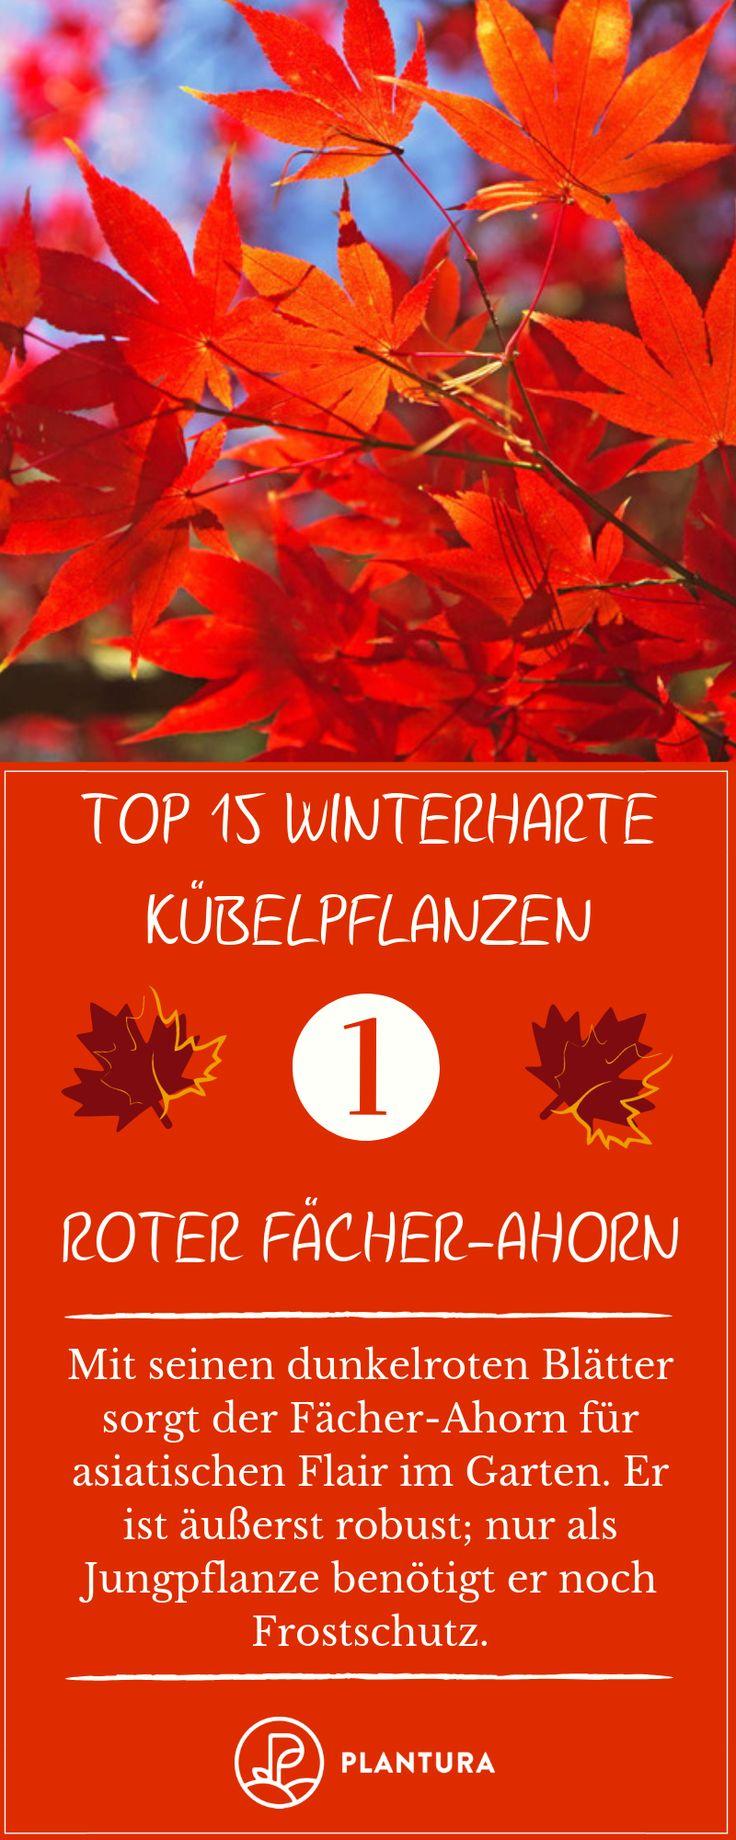 Winterharte k belpflanzen unsere top 15 topfpflanzen for Topfpflanzen winterhart